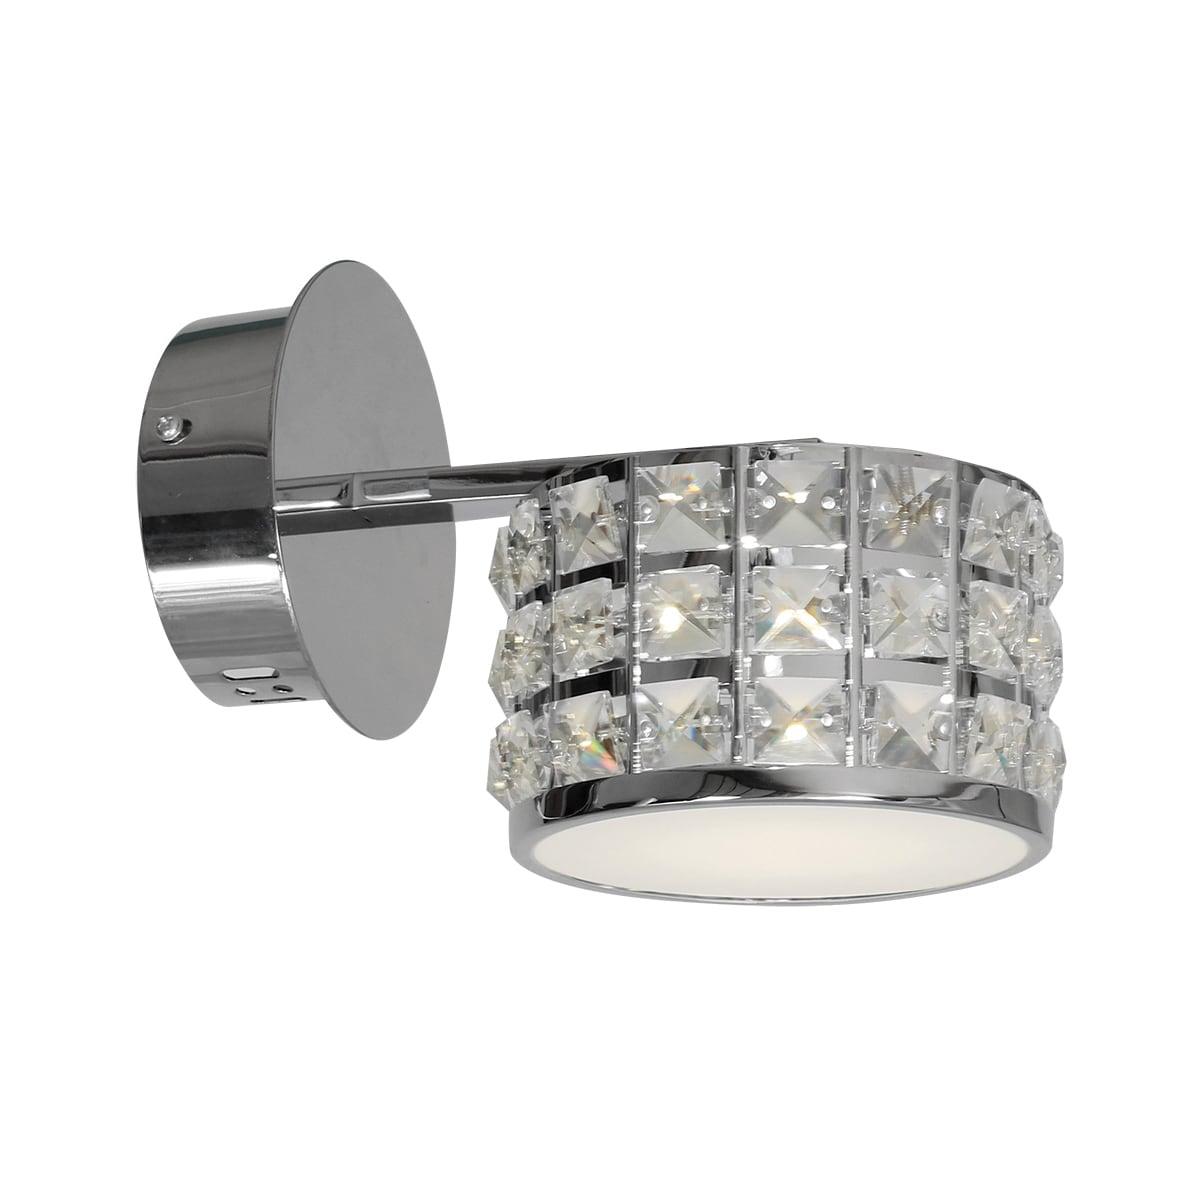 Nástěnné svítidlo Milagro ALEX 172 Chrome 5W